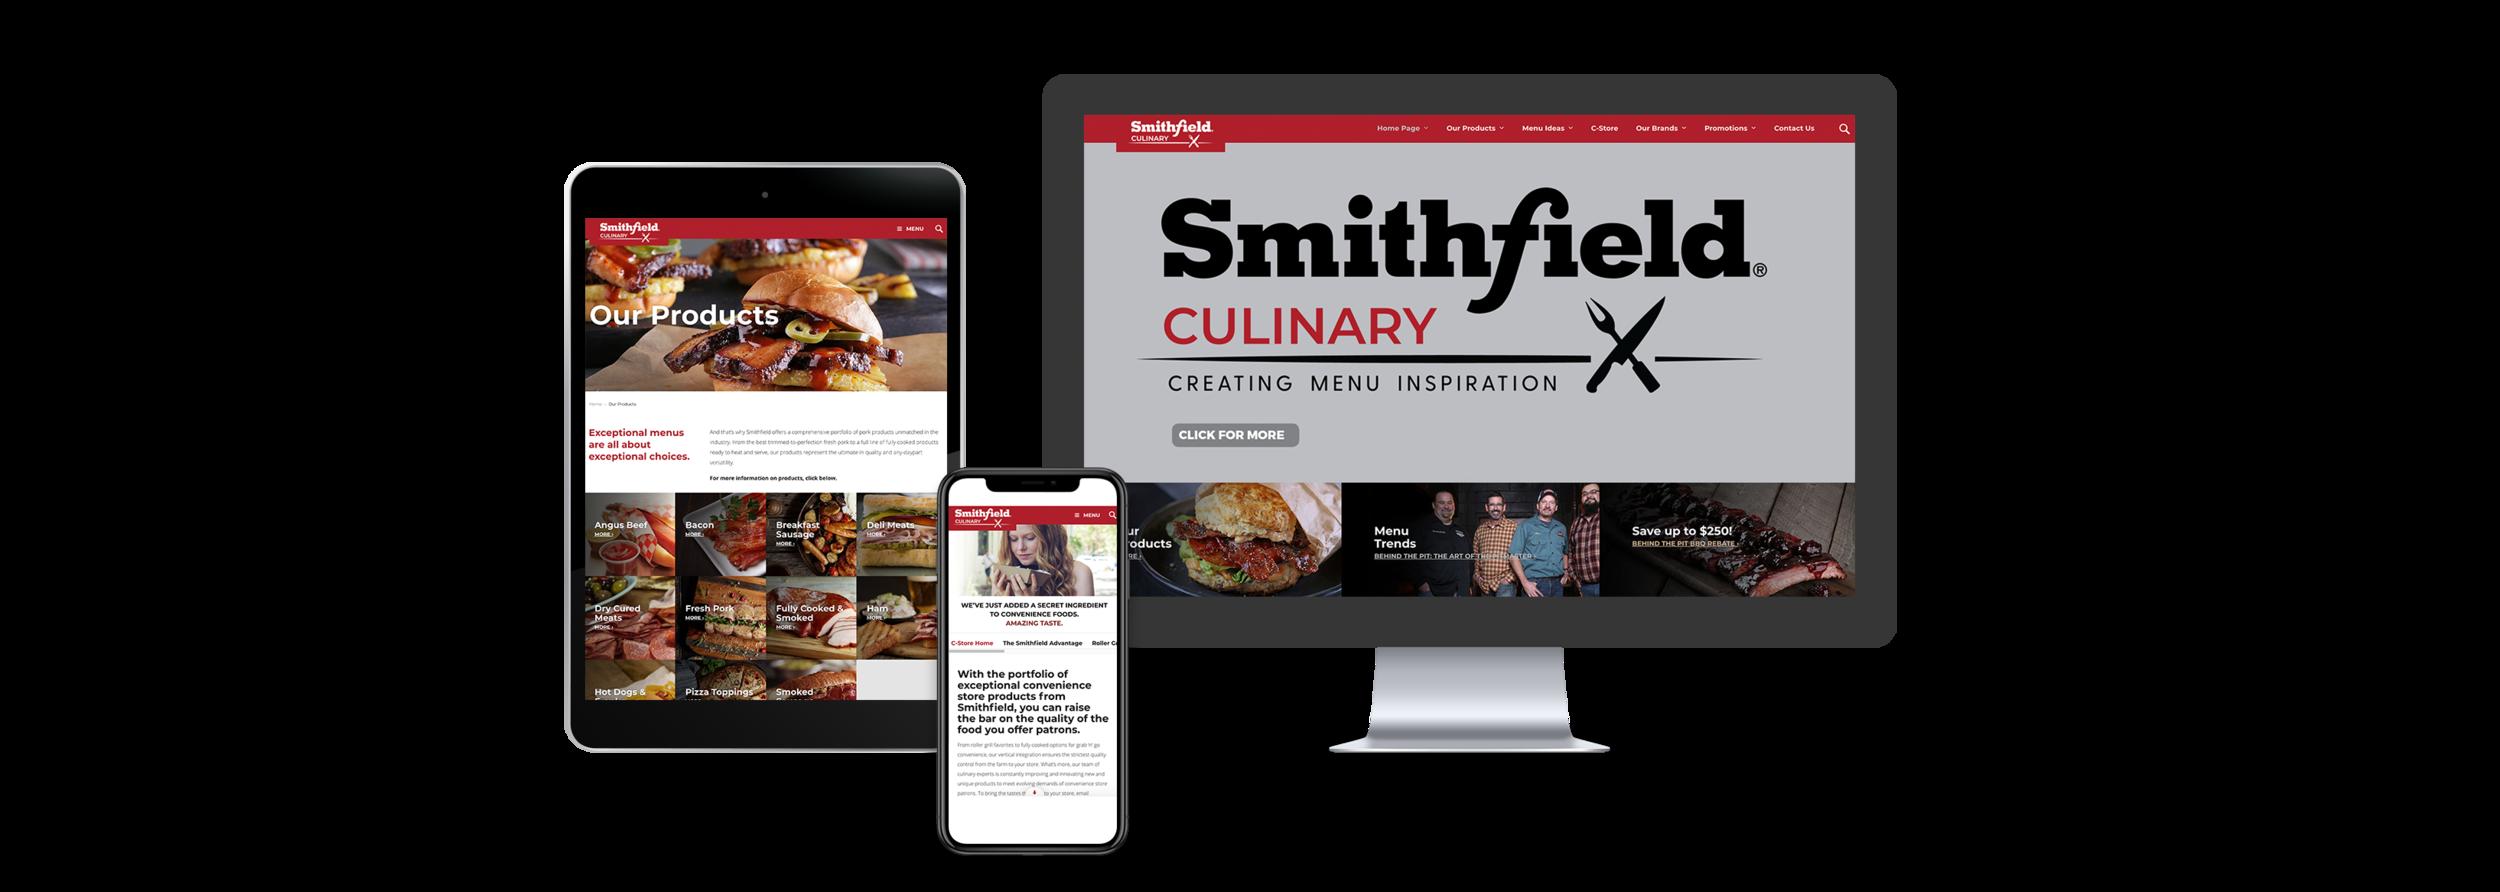 CulinaryWebsite.png